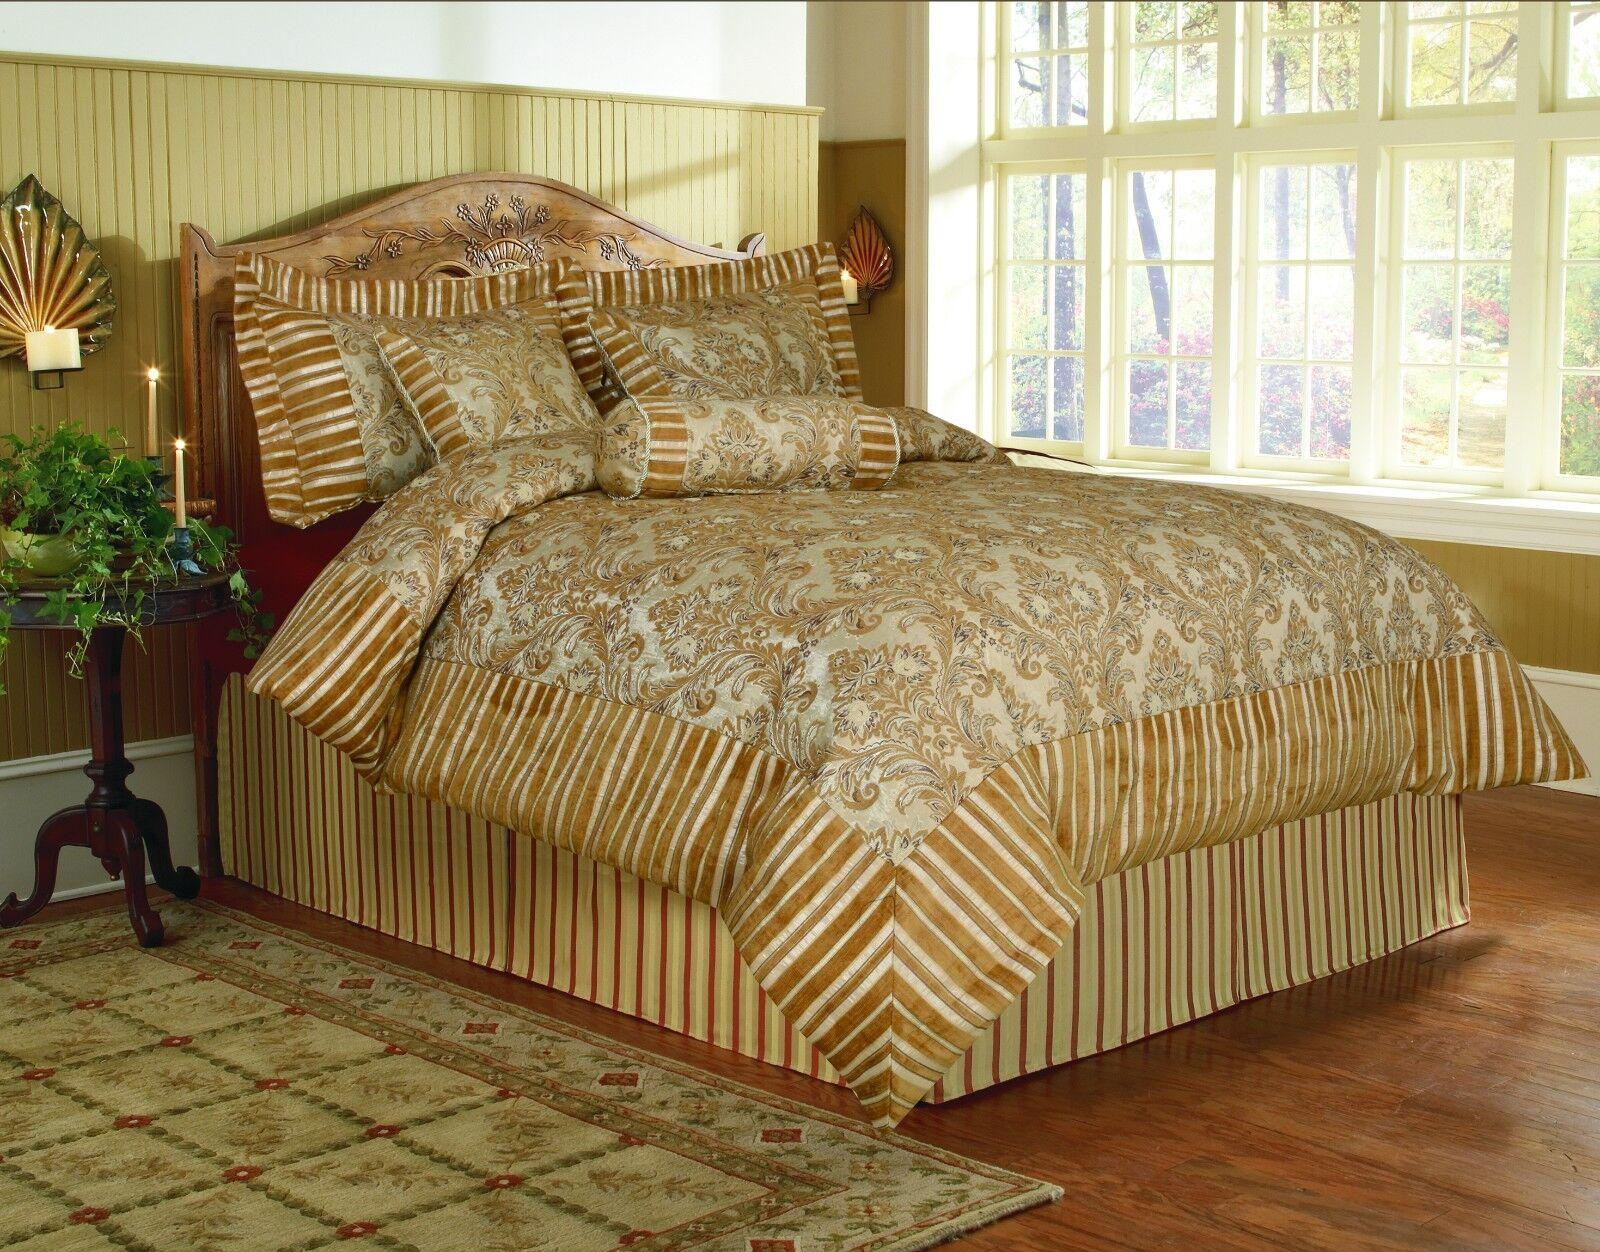 Tache 6 PC Luxury Fancy Golden Floral Paisley Fall's End Chenille Comforter Set